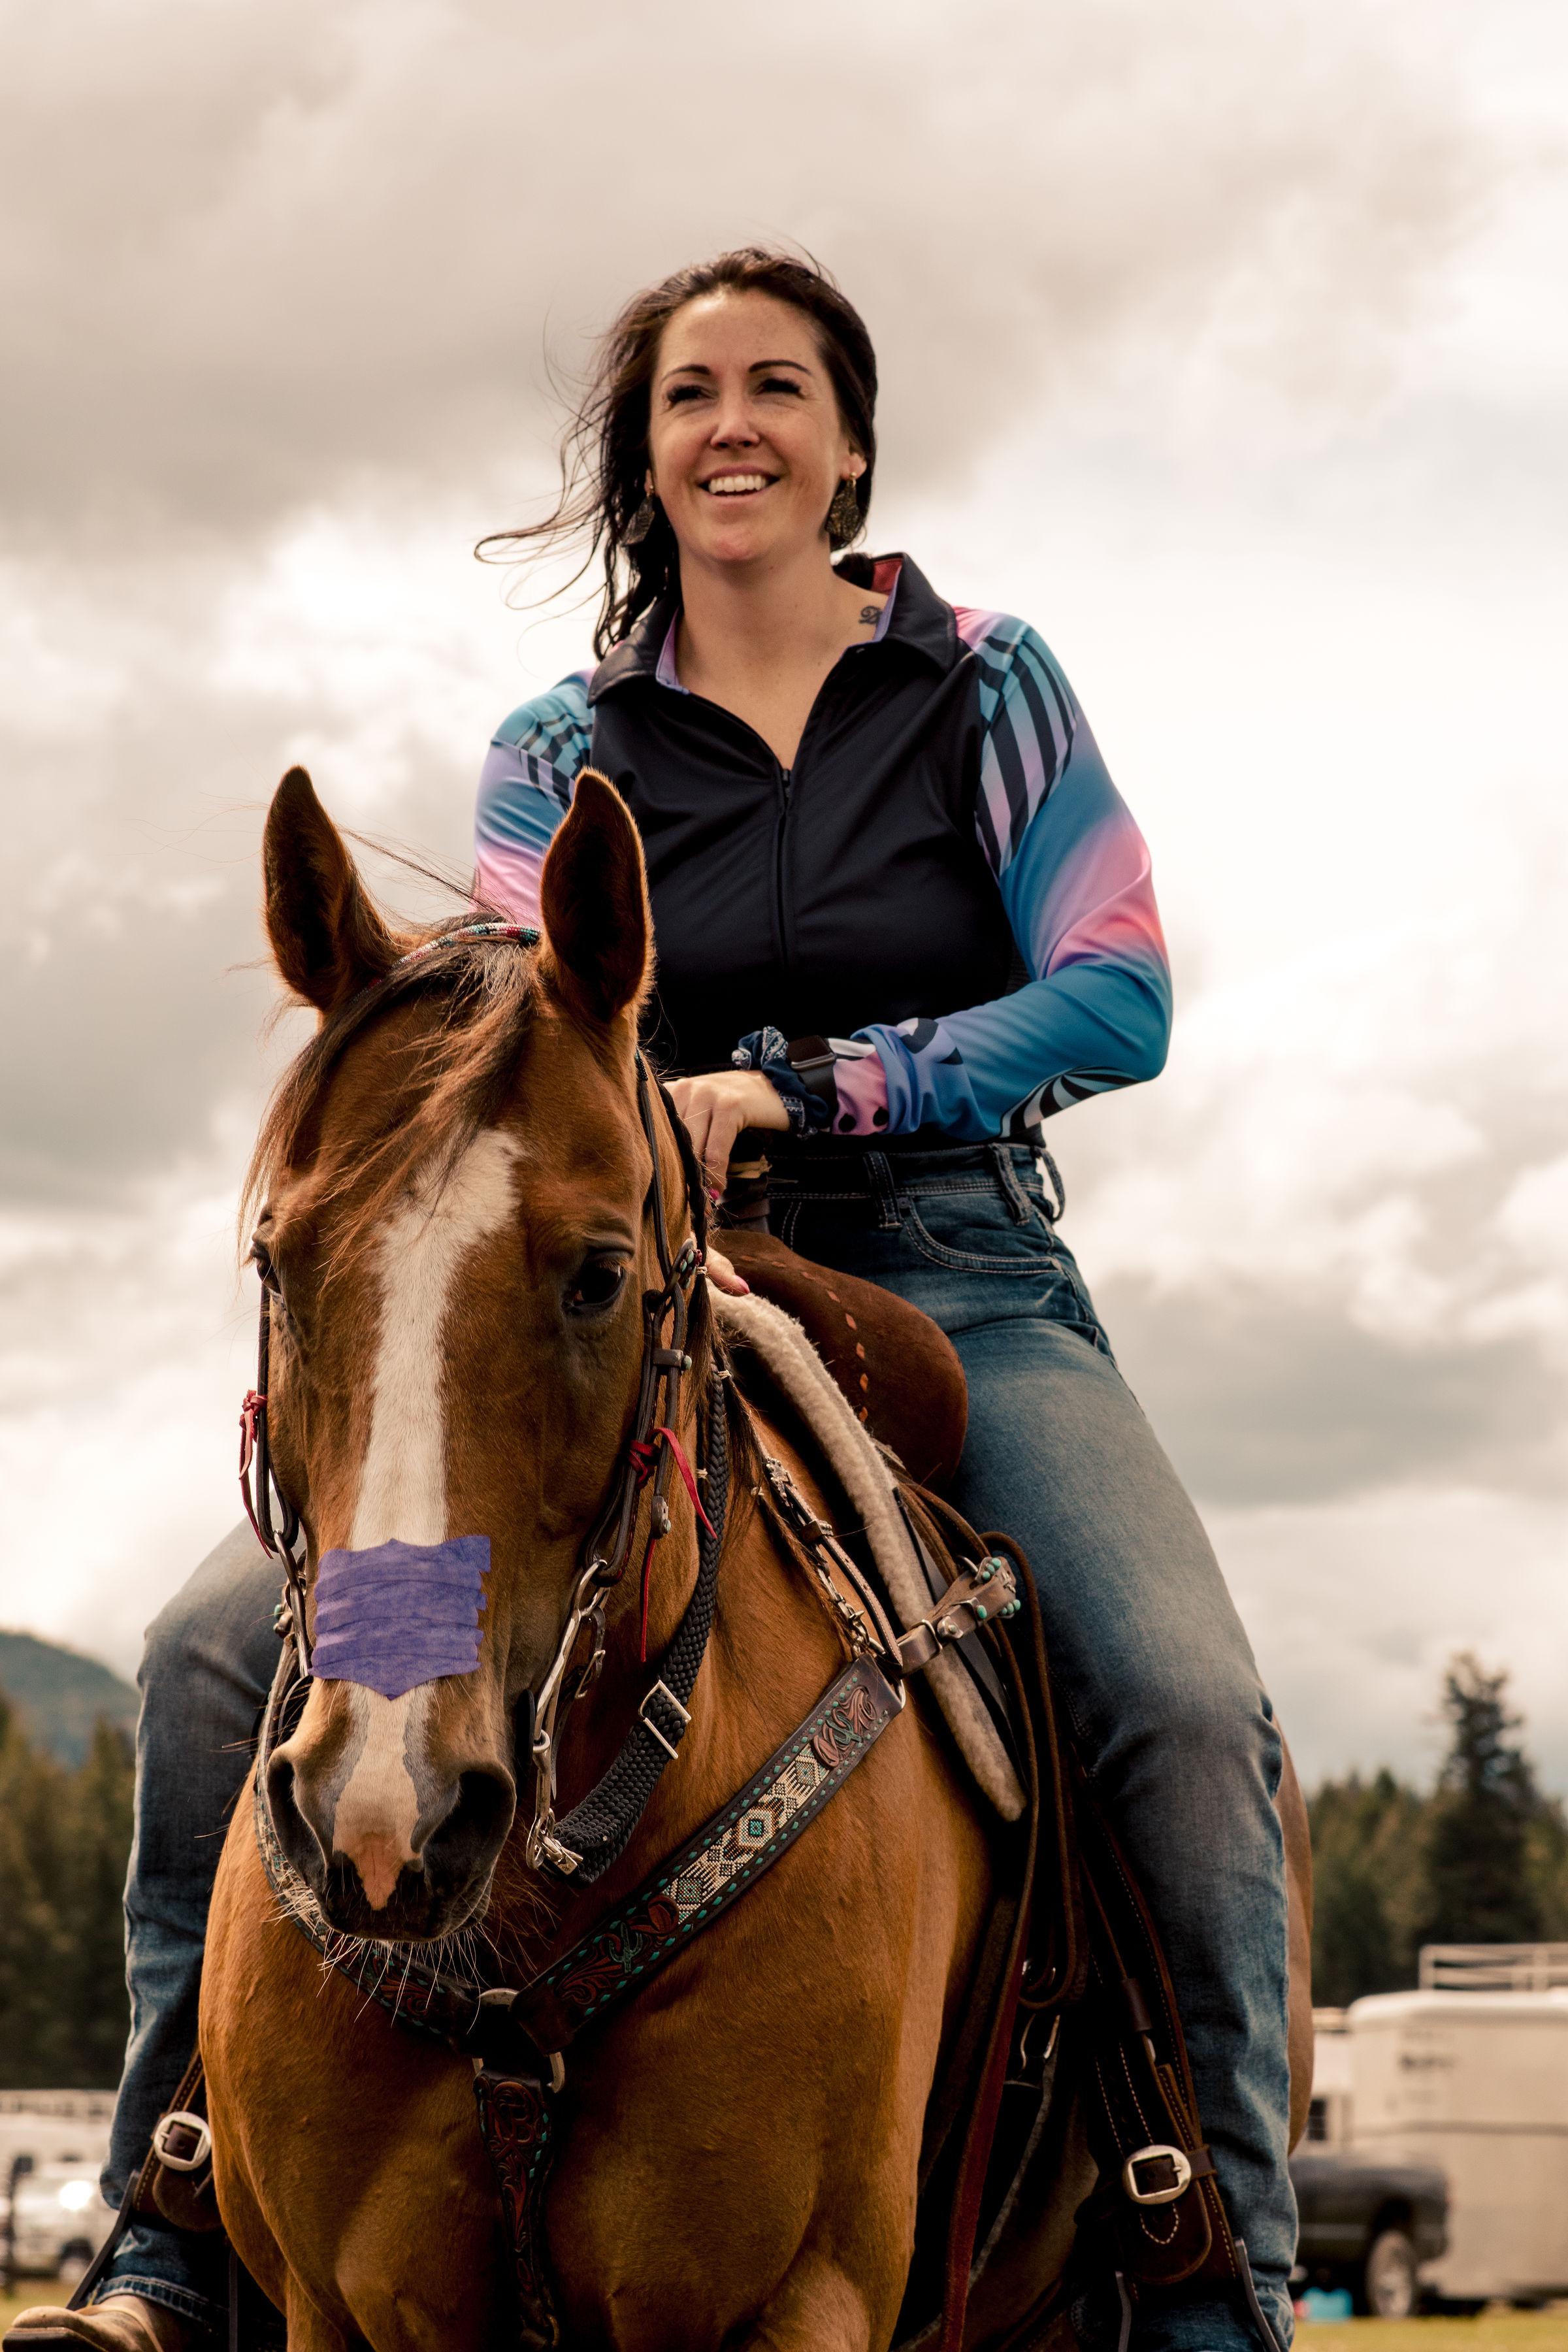 Natalie Kosterman, Team FLAIR